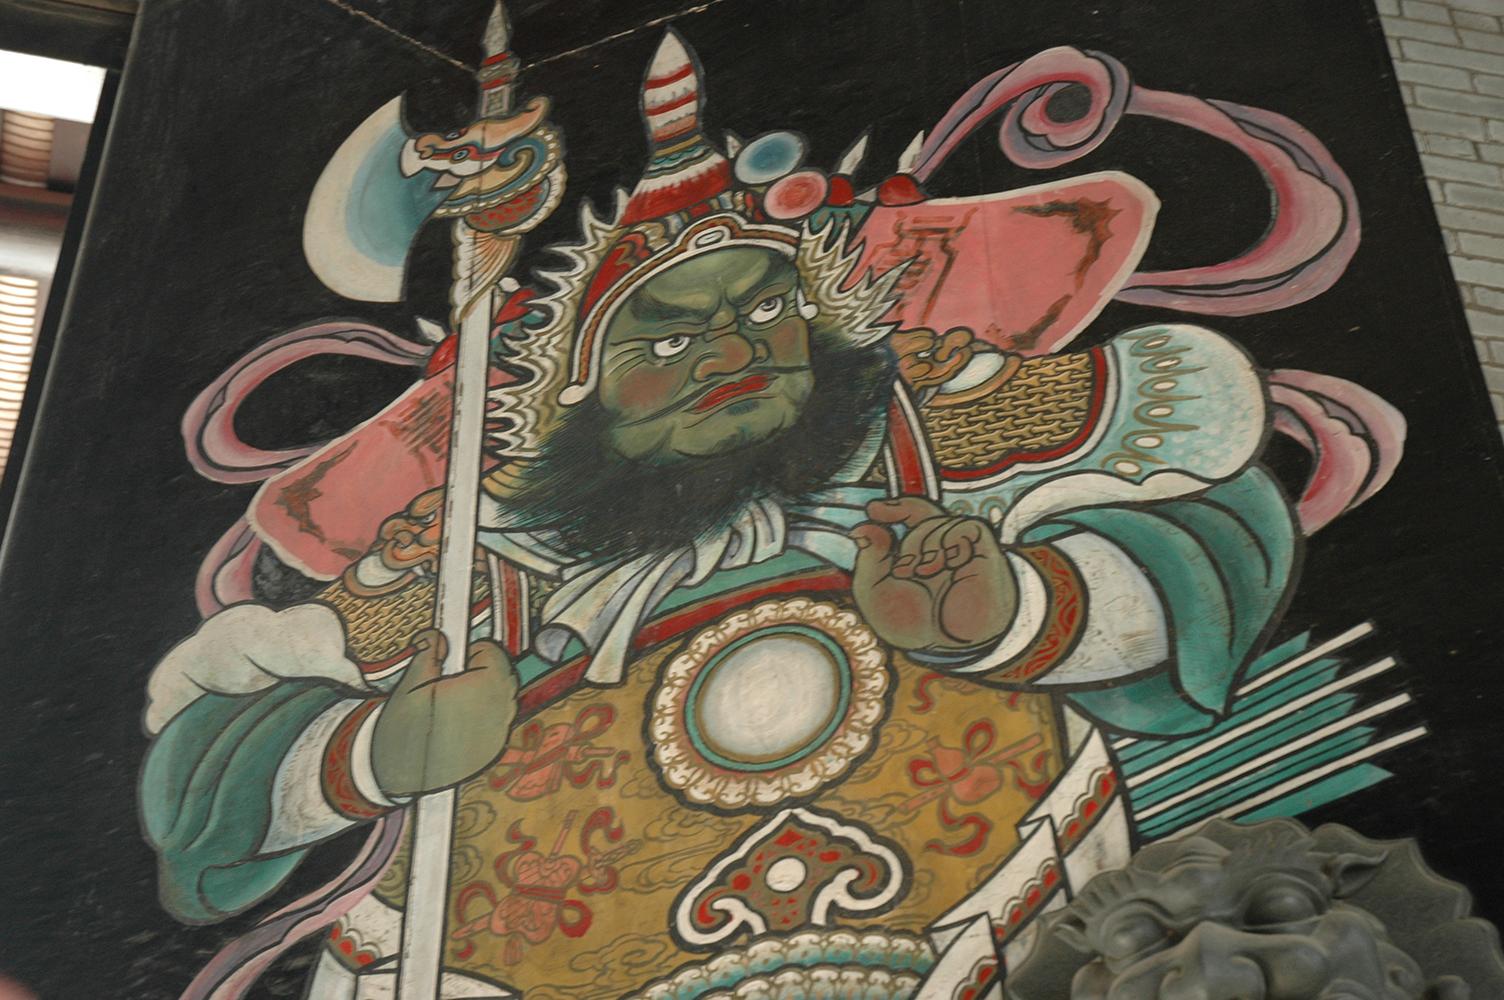 China_God_Chen Temple_1504x1000.jpg